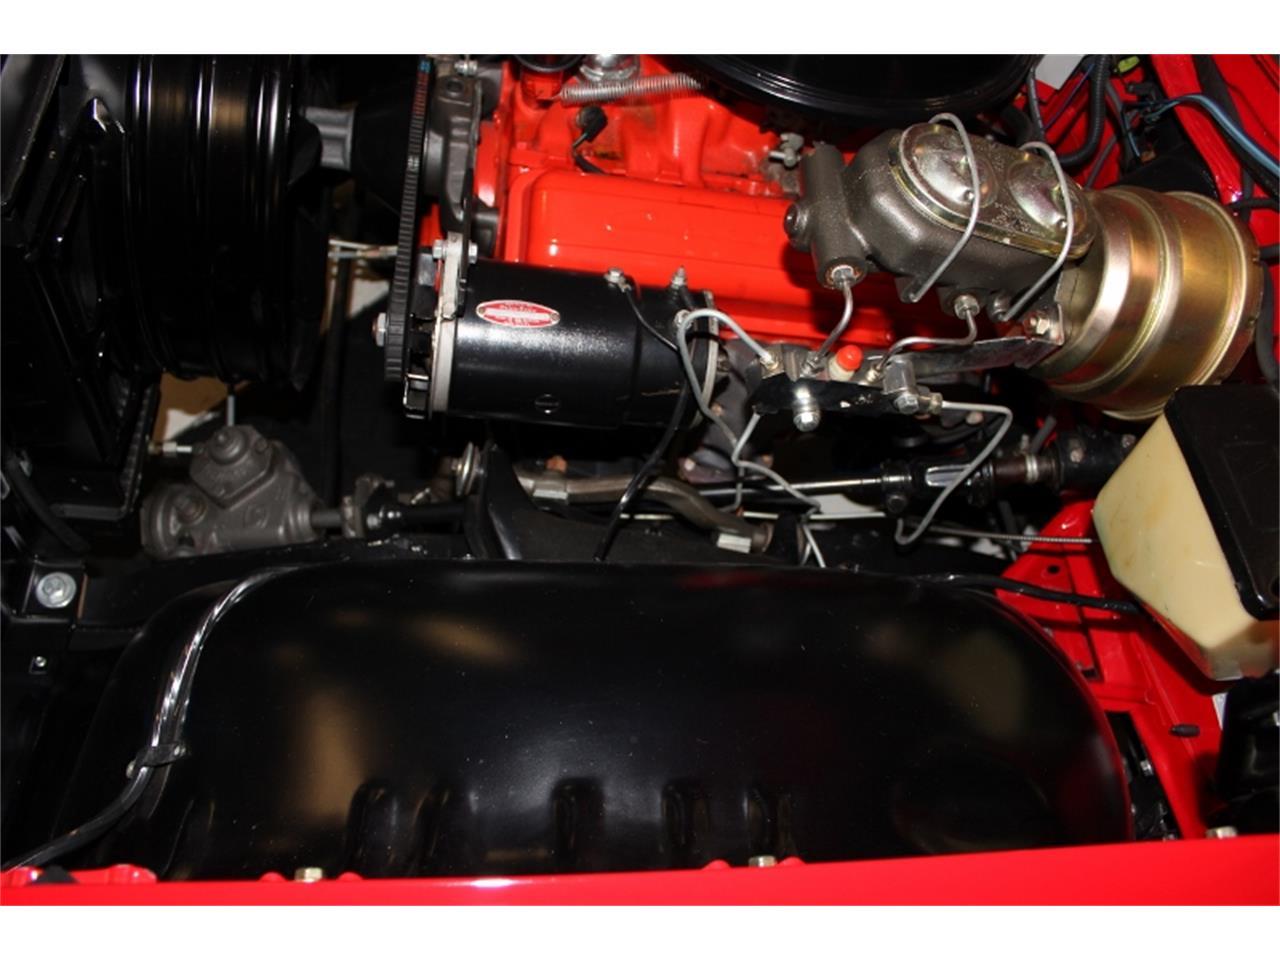 Large Picture of Classic '61 Impala located in Lillington North Carolina - $58,000.00 - J60W